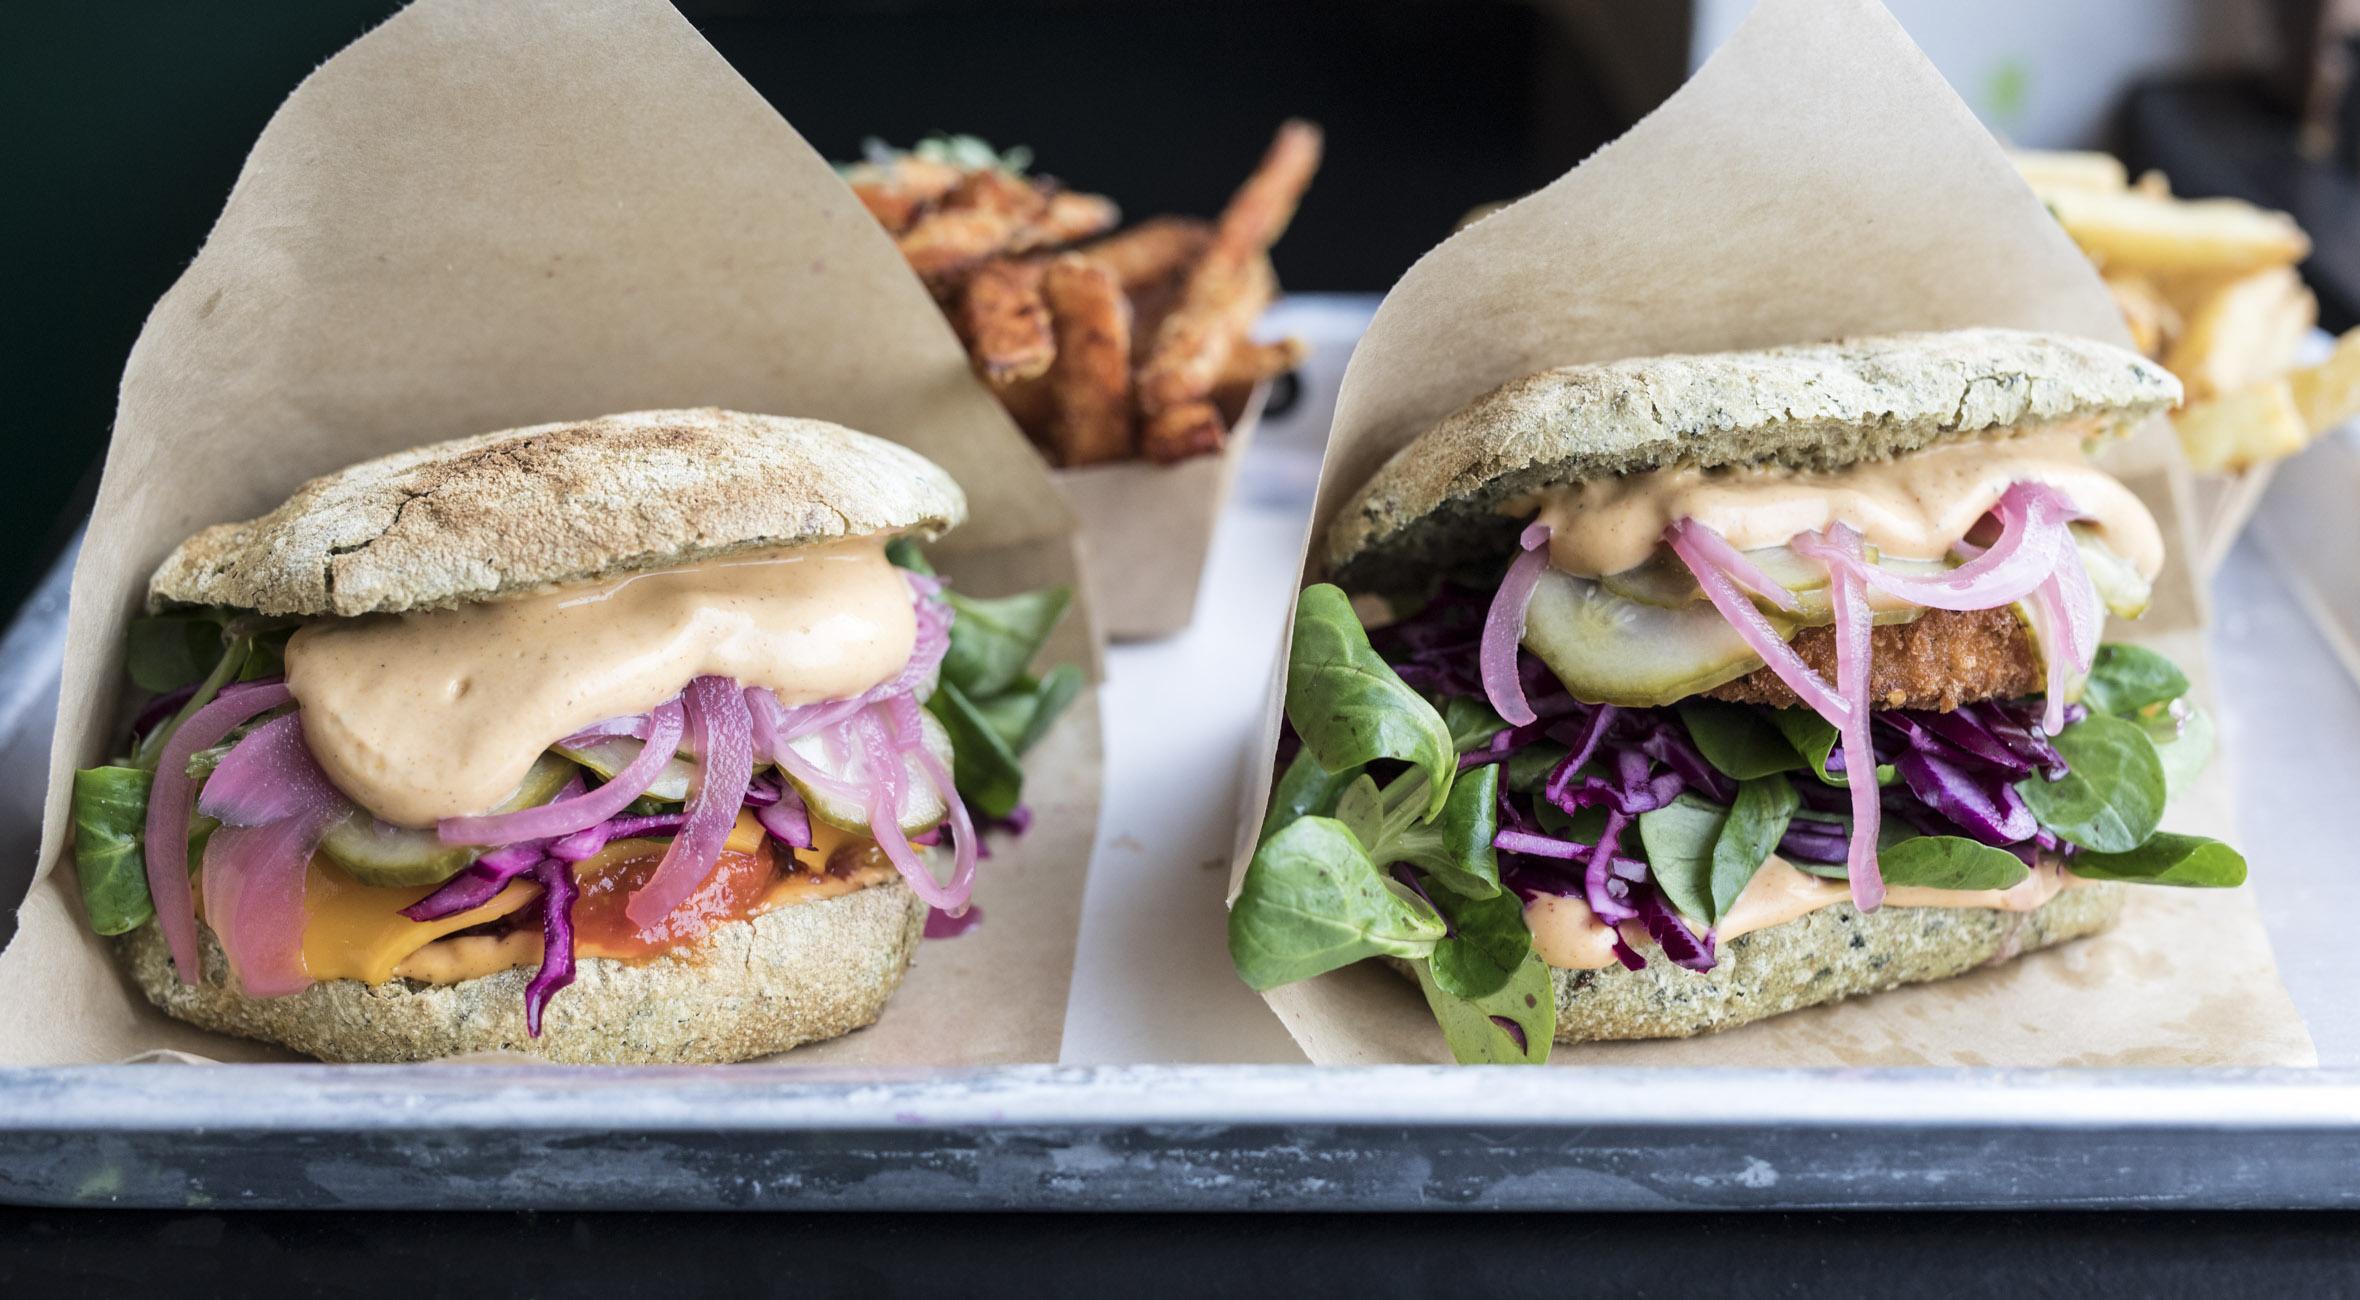 2 burgere med fritter & øko-soda hos GreenBurger – Nyd vilde veganske burgere over for Torvehallerne